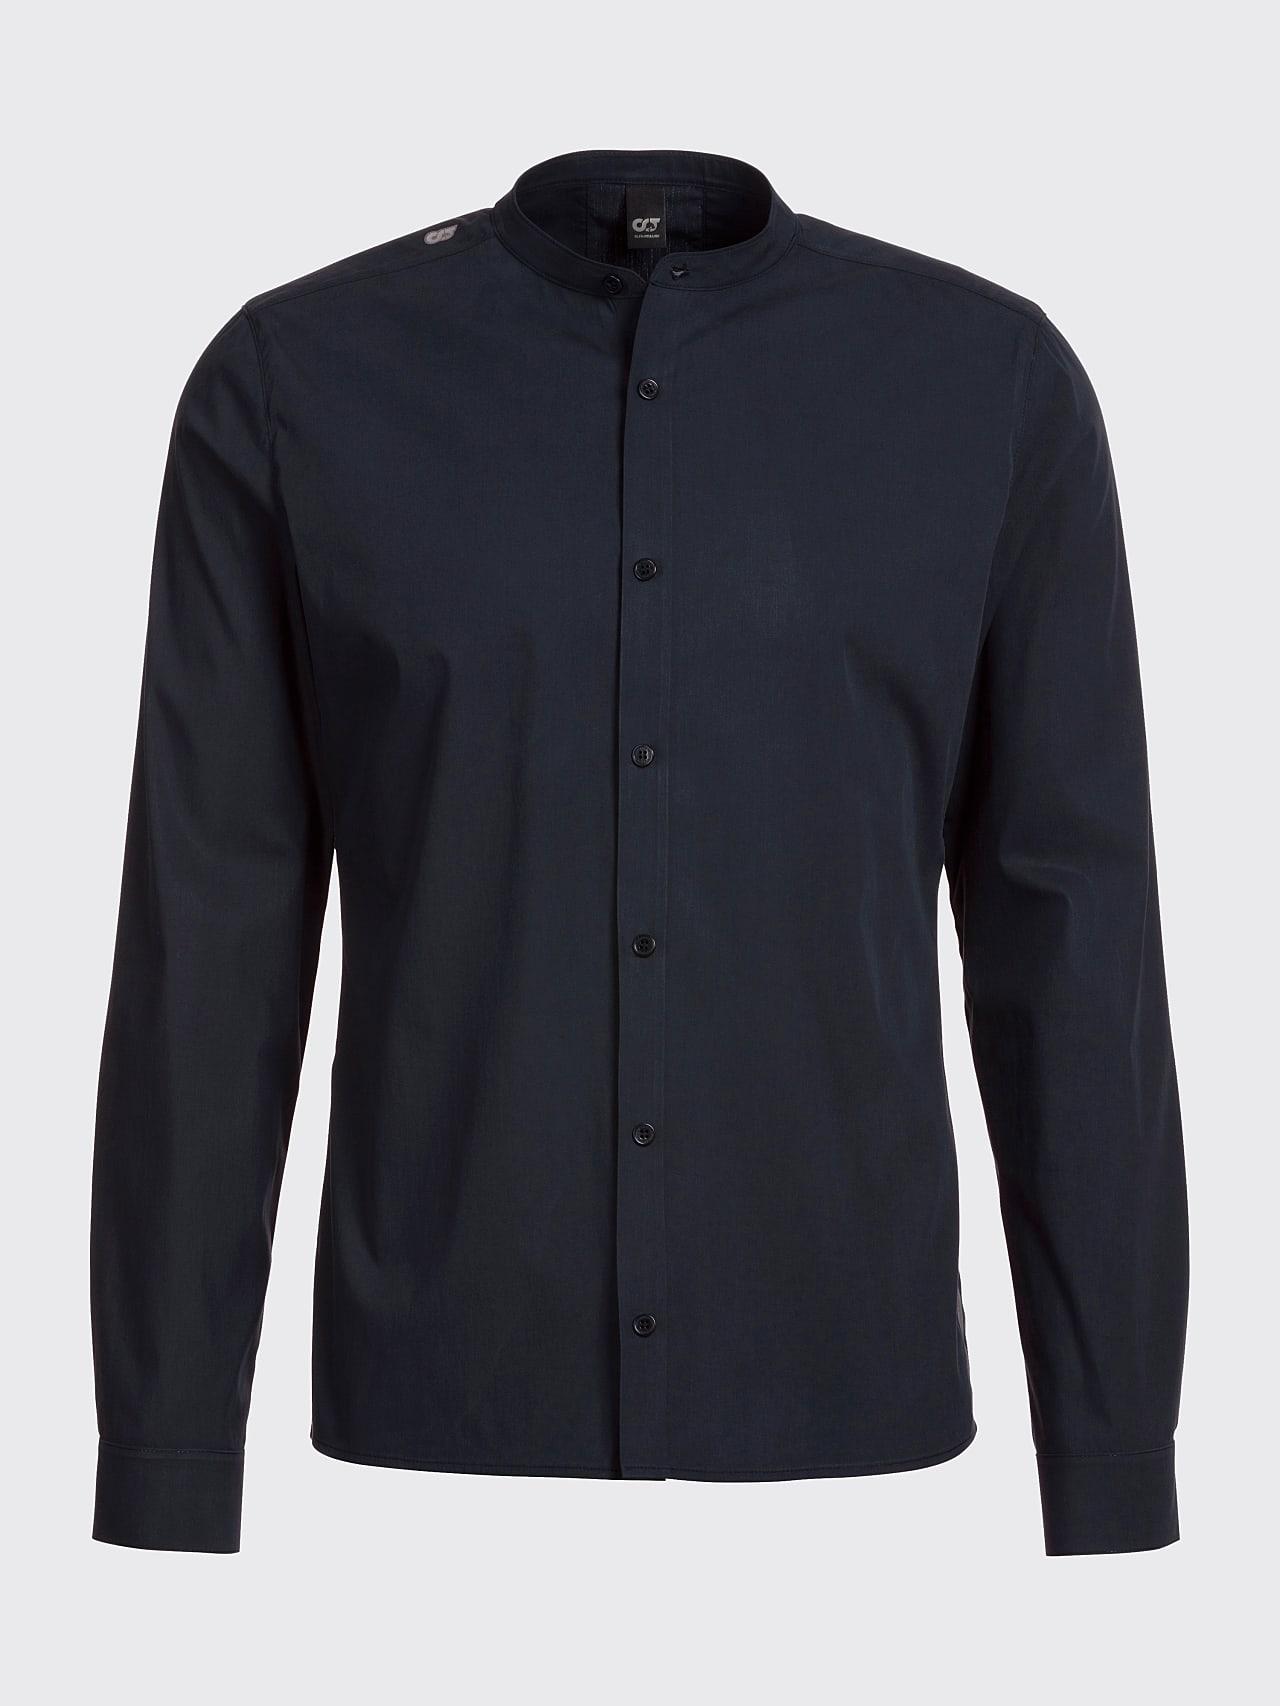 WIDT V9.Y5.01 Stand-Up Collar Cotton-Stretch Shirt navy Back Alpha Tauri